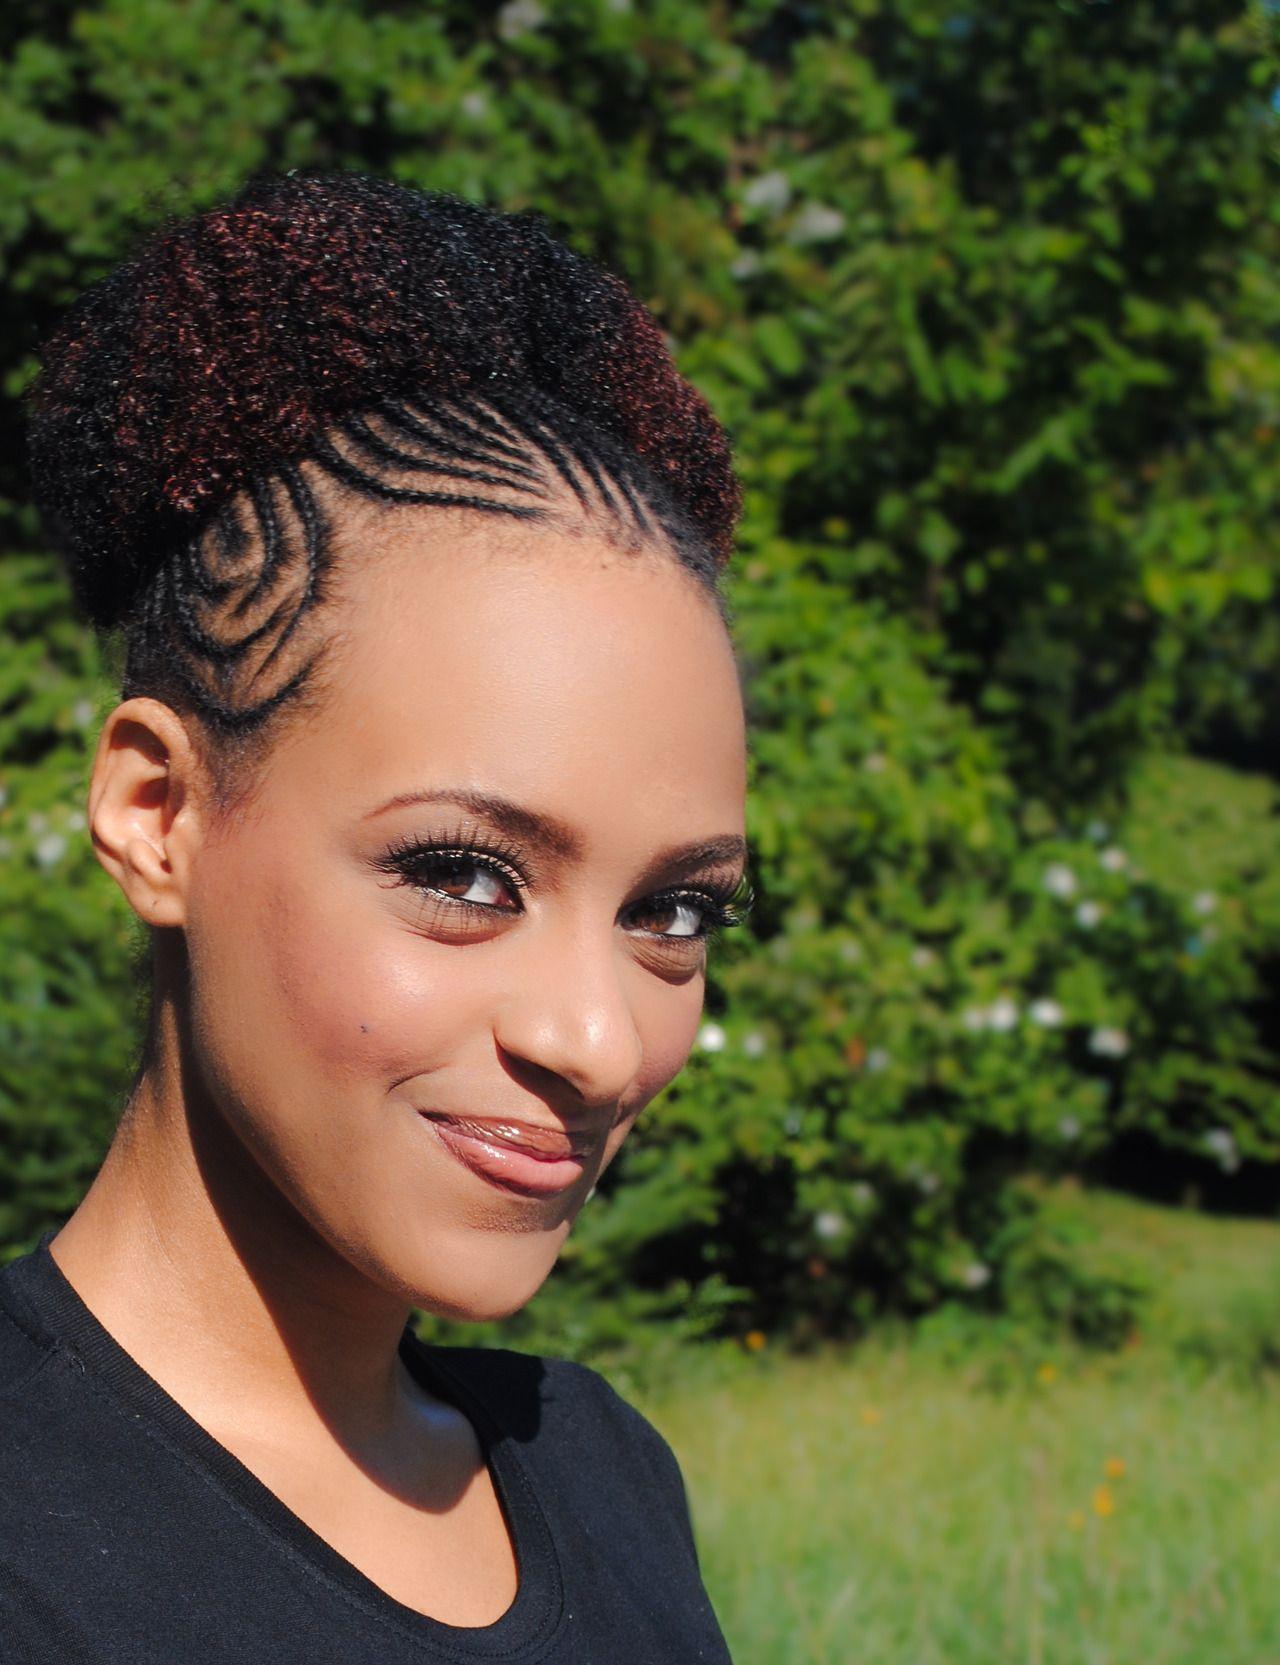 Astounding 1000 Images About Things I Love On Pinterest Black Women Short Hairstyles Gunalazisus